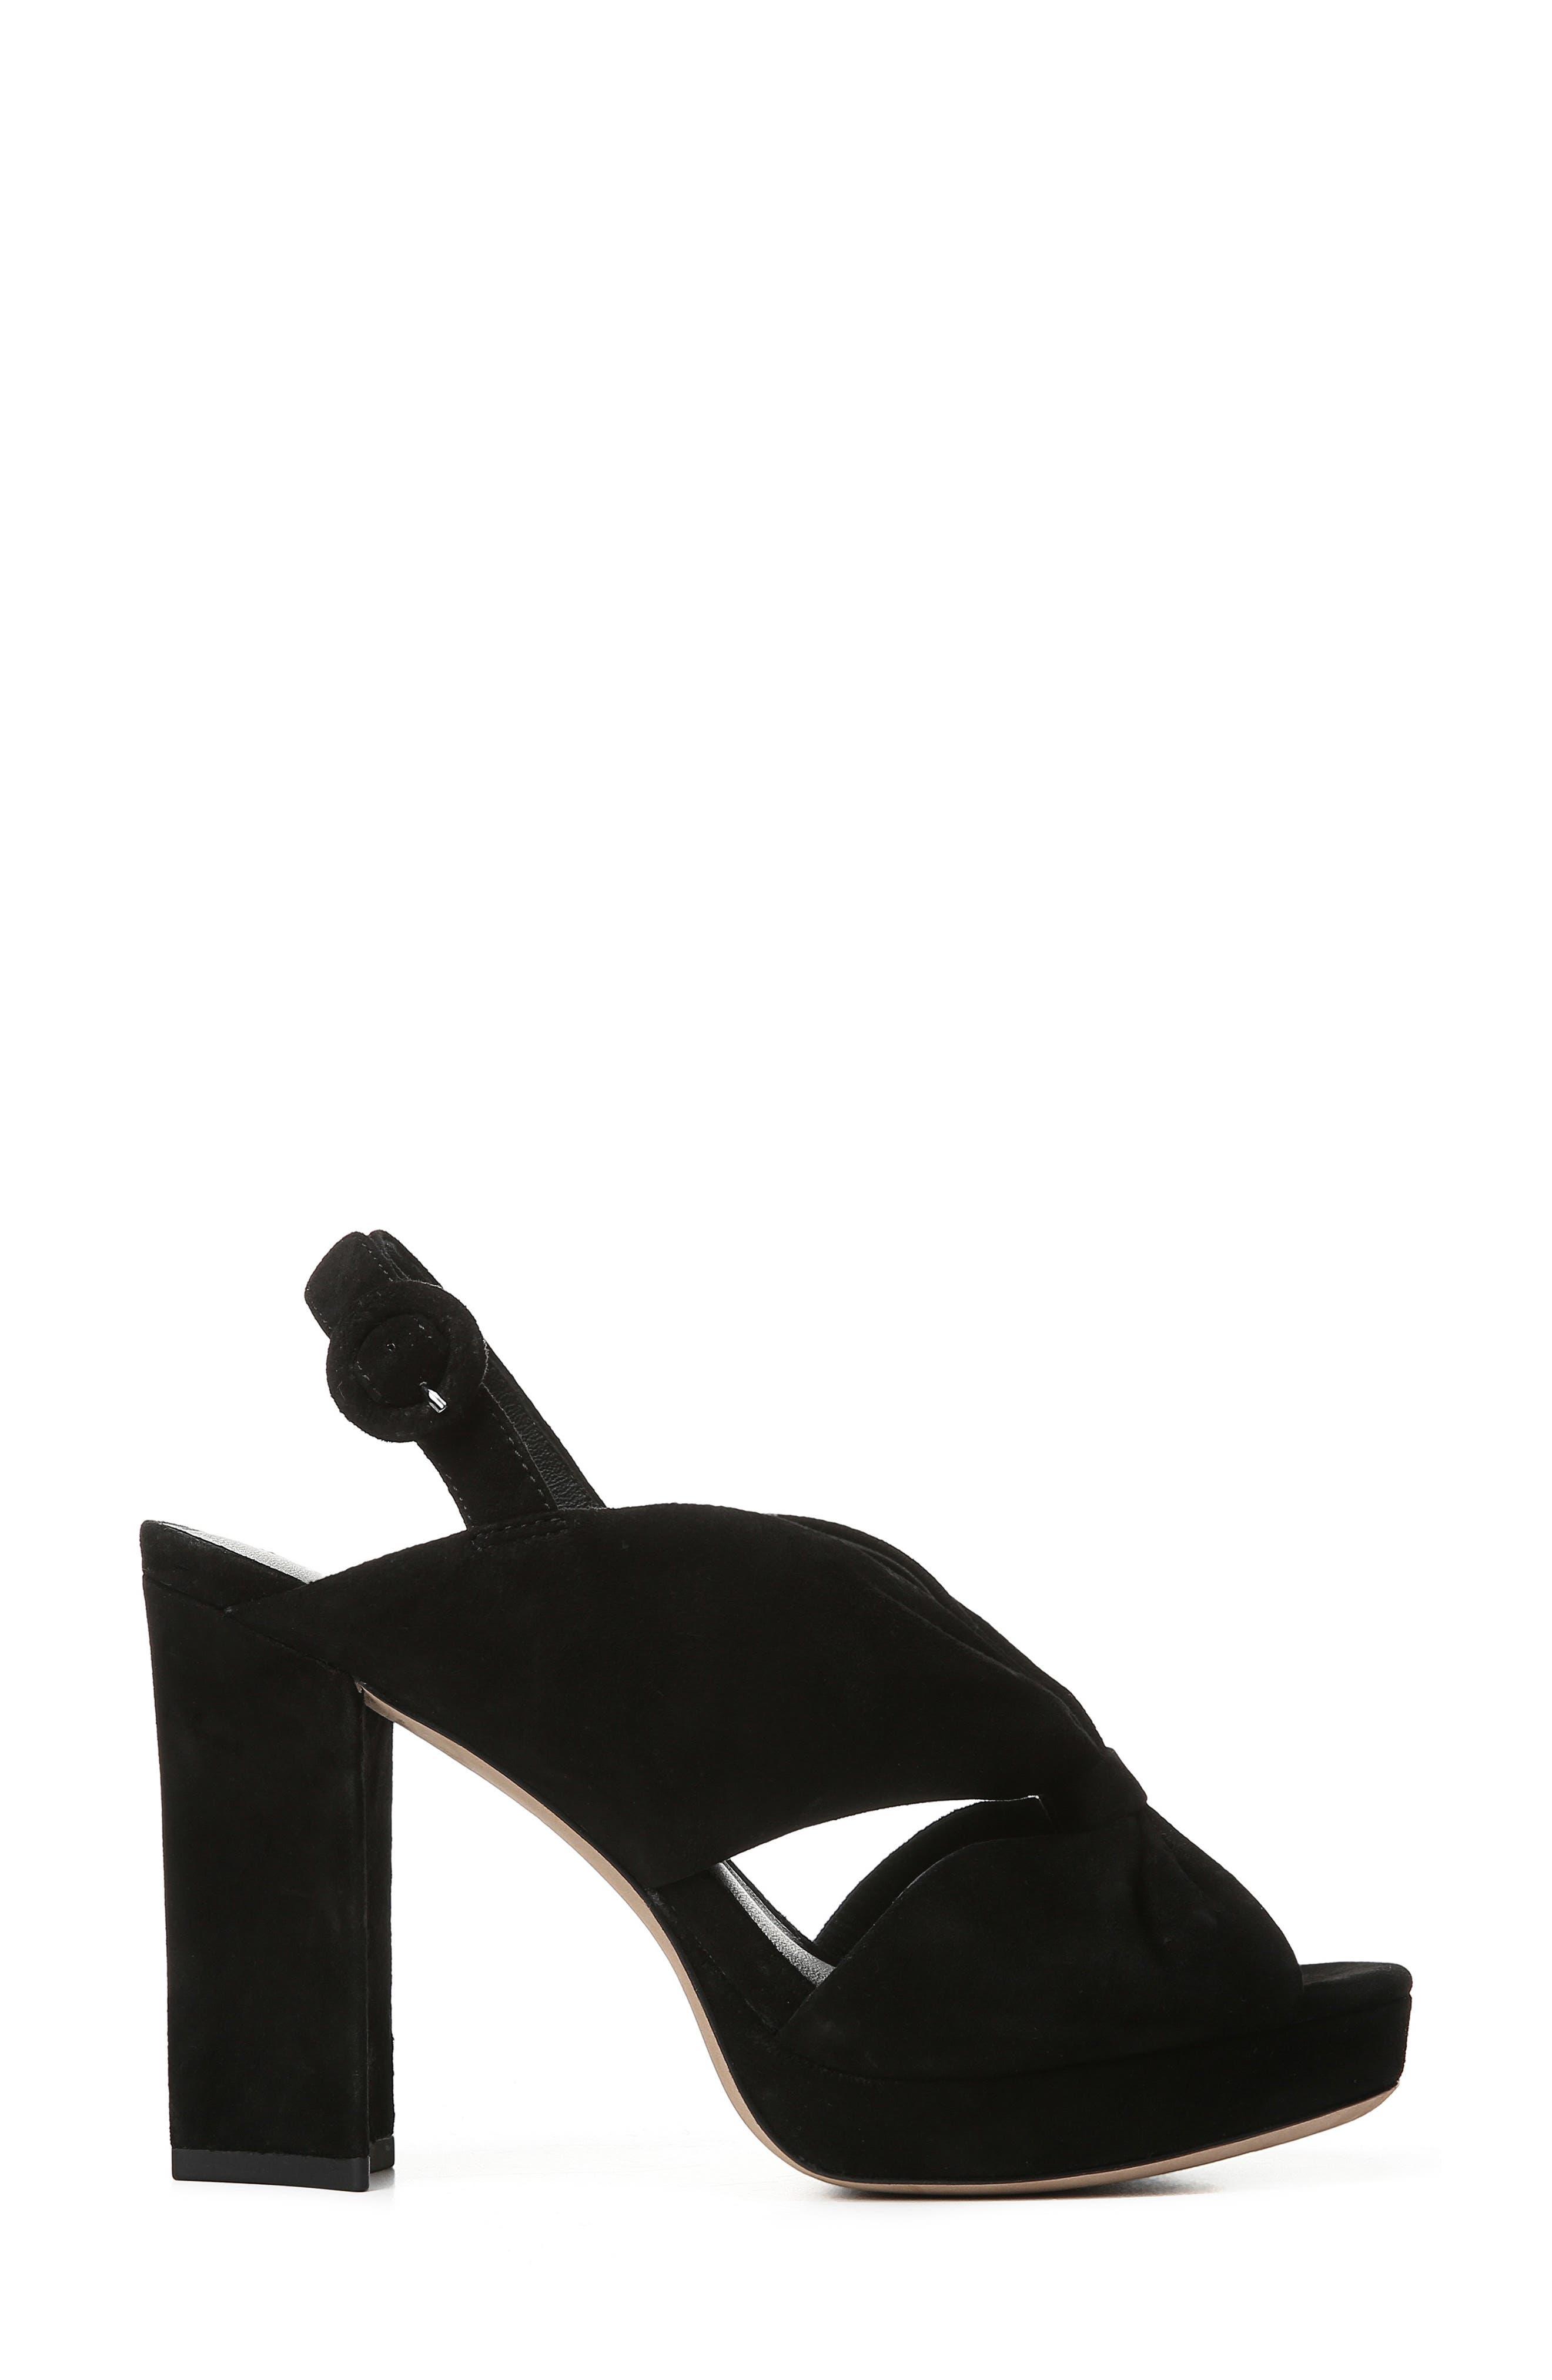 DIANE VON FURSTENBERG, Heidi Platform Sandal, Alternate thumbnail 3, color, BLACK